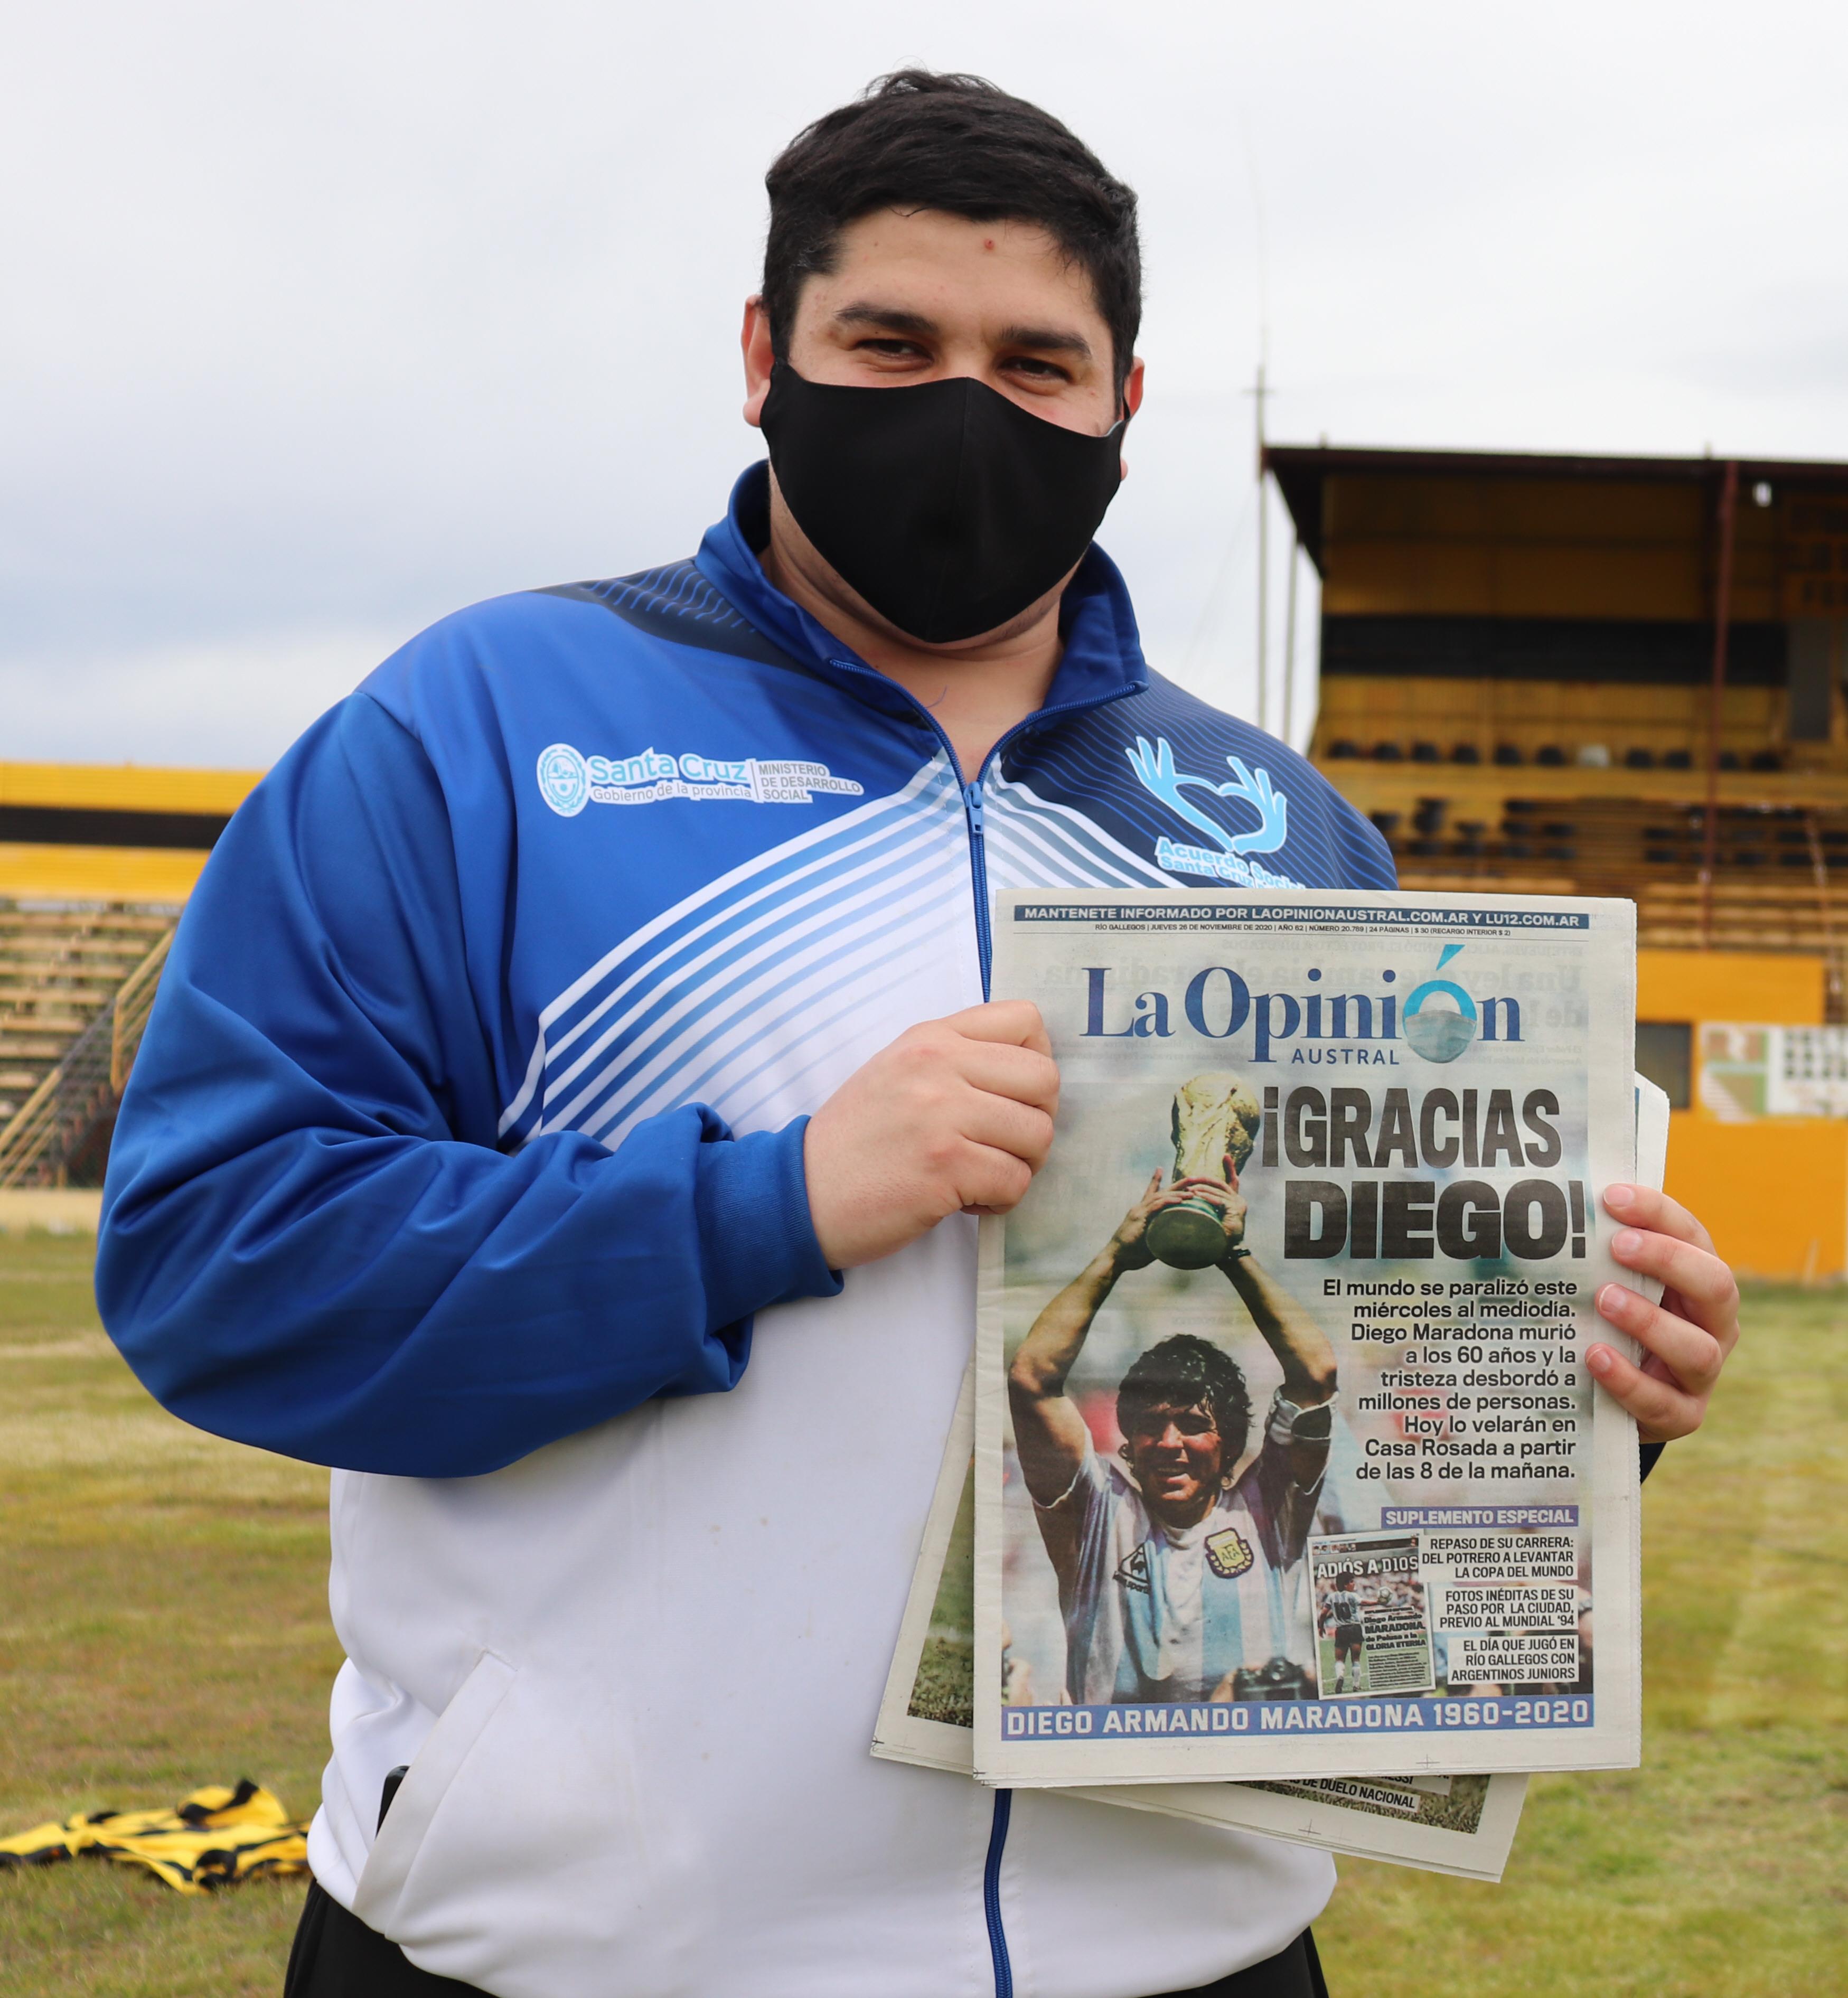 Marcos Tello posando con la tapa de LOA.FOTO: MIRTA VELÁSQUEZ / LA OPINIÓN AUSTRAL